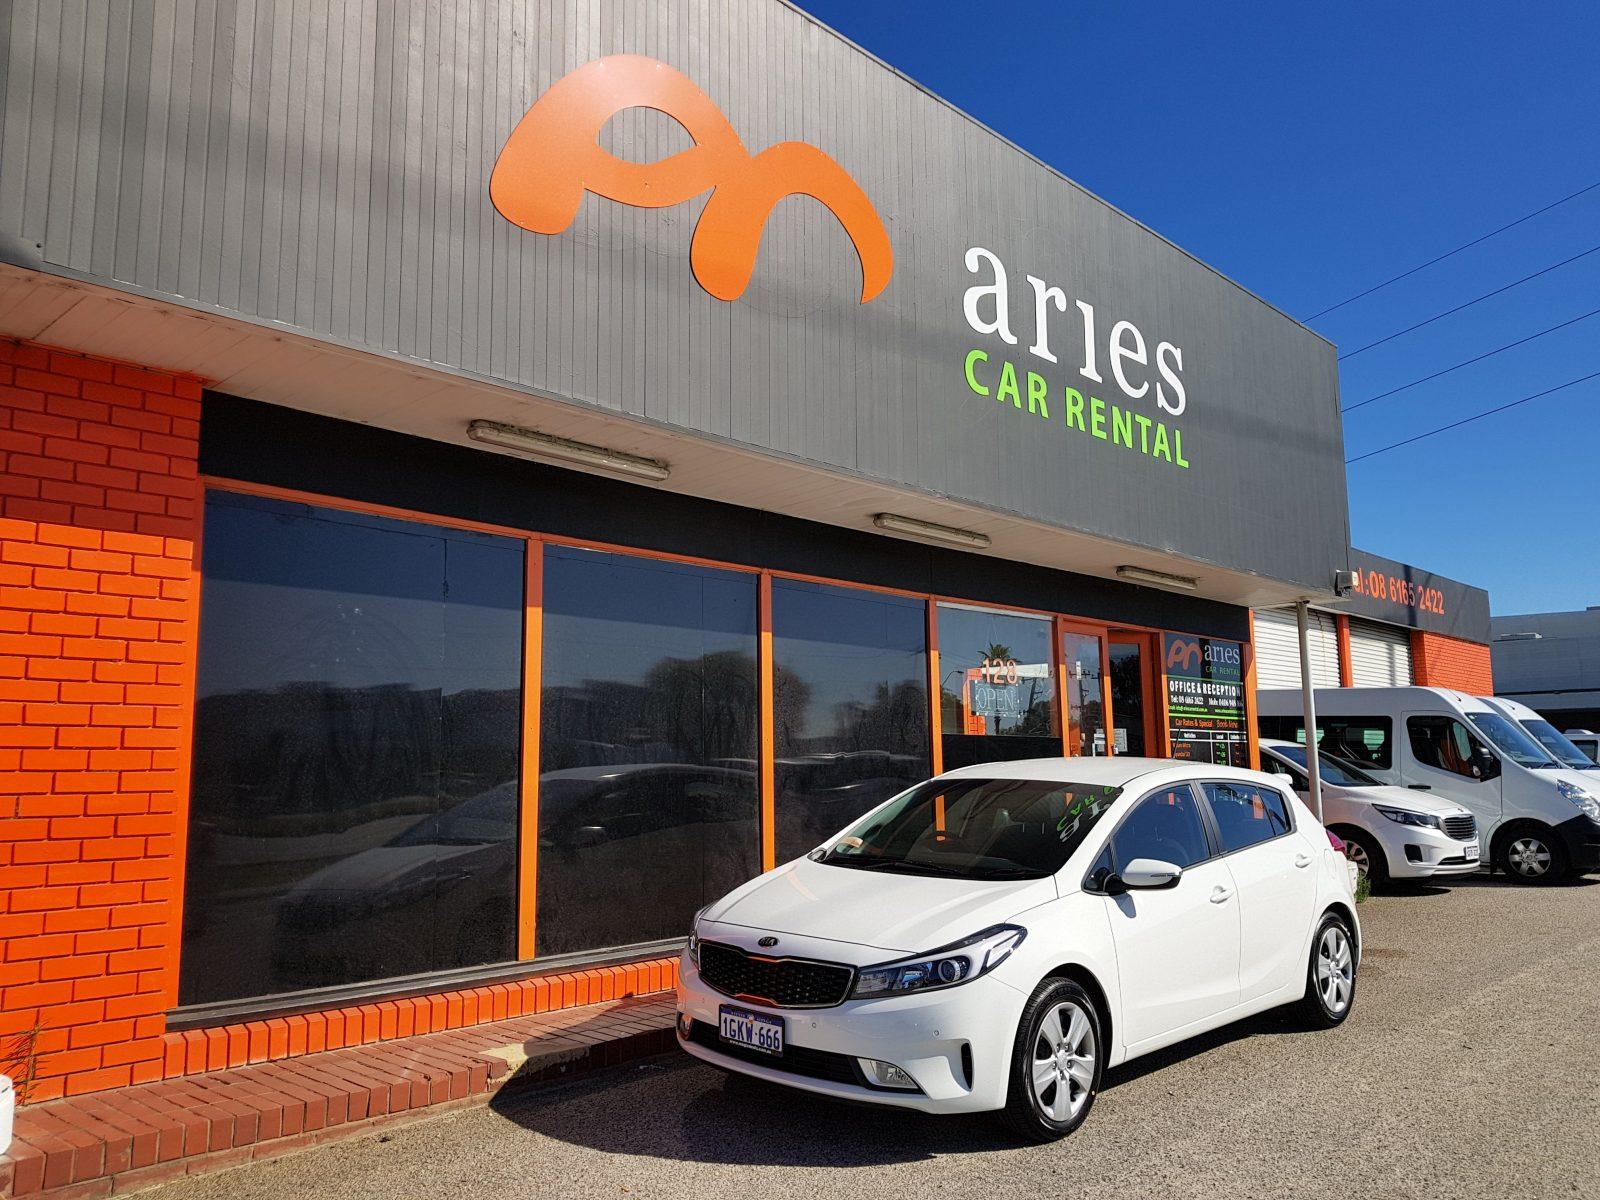 Aries Car Rental, East Perth, Western Australia